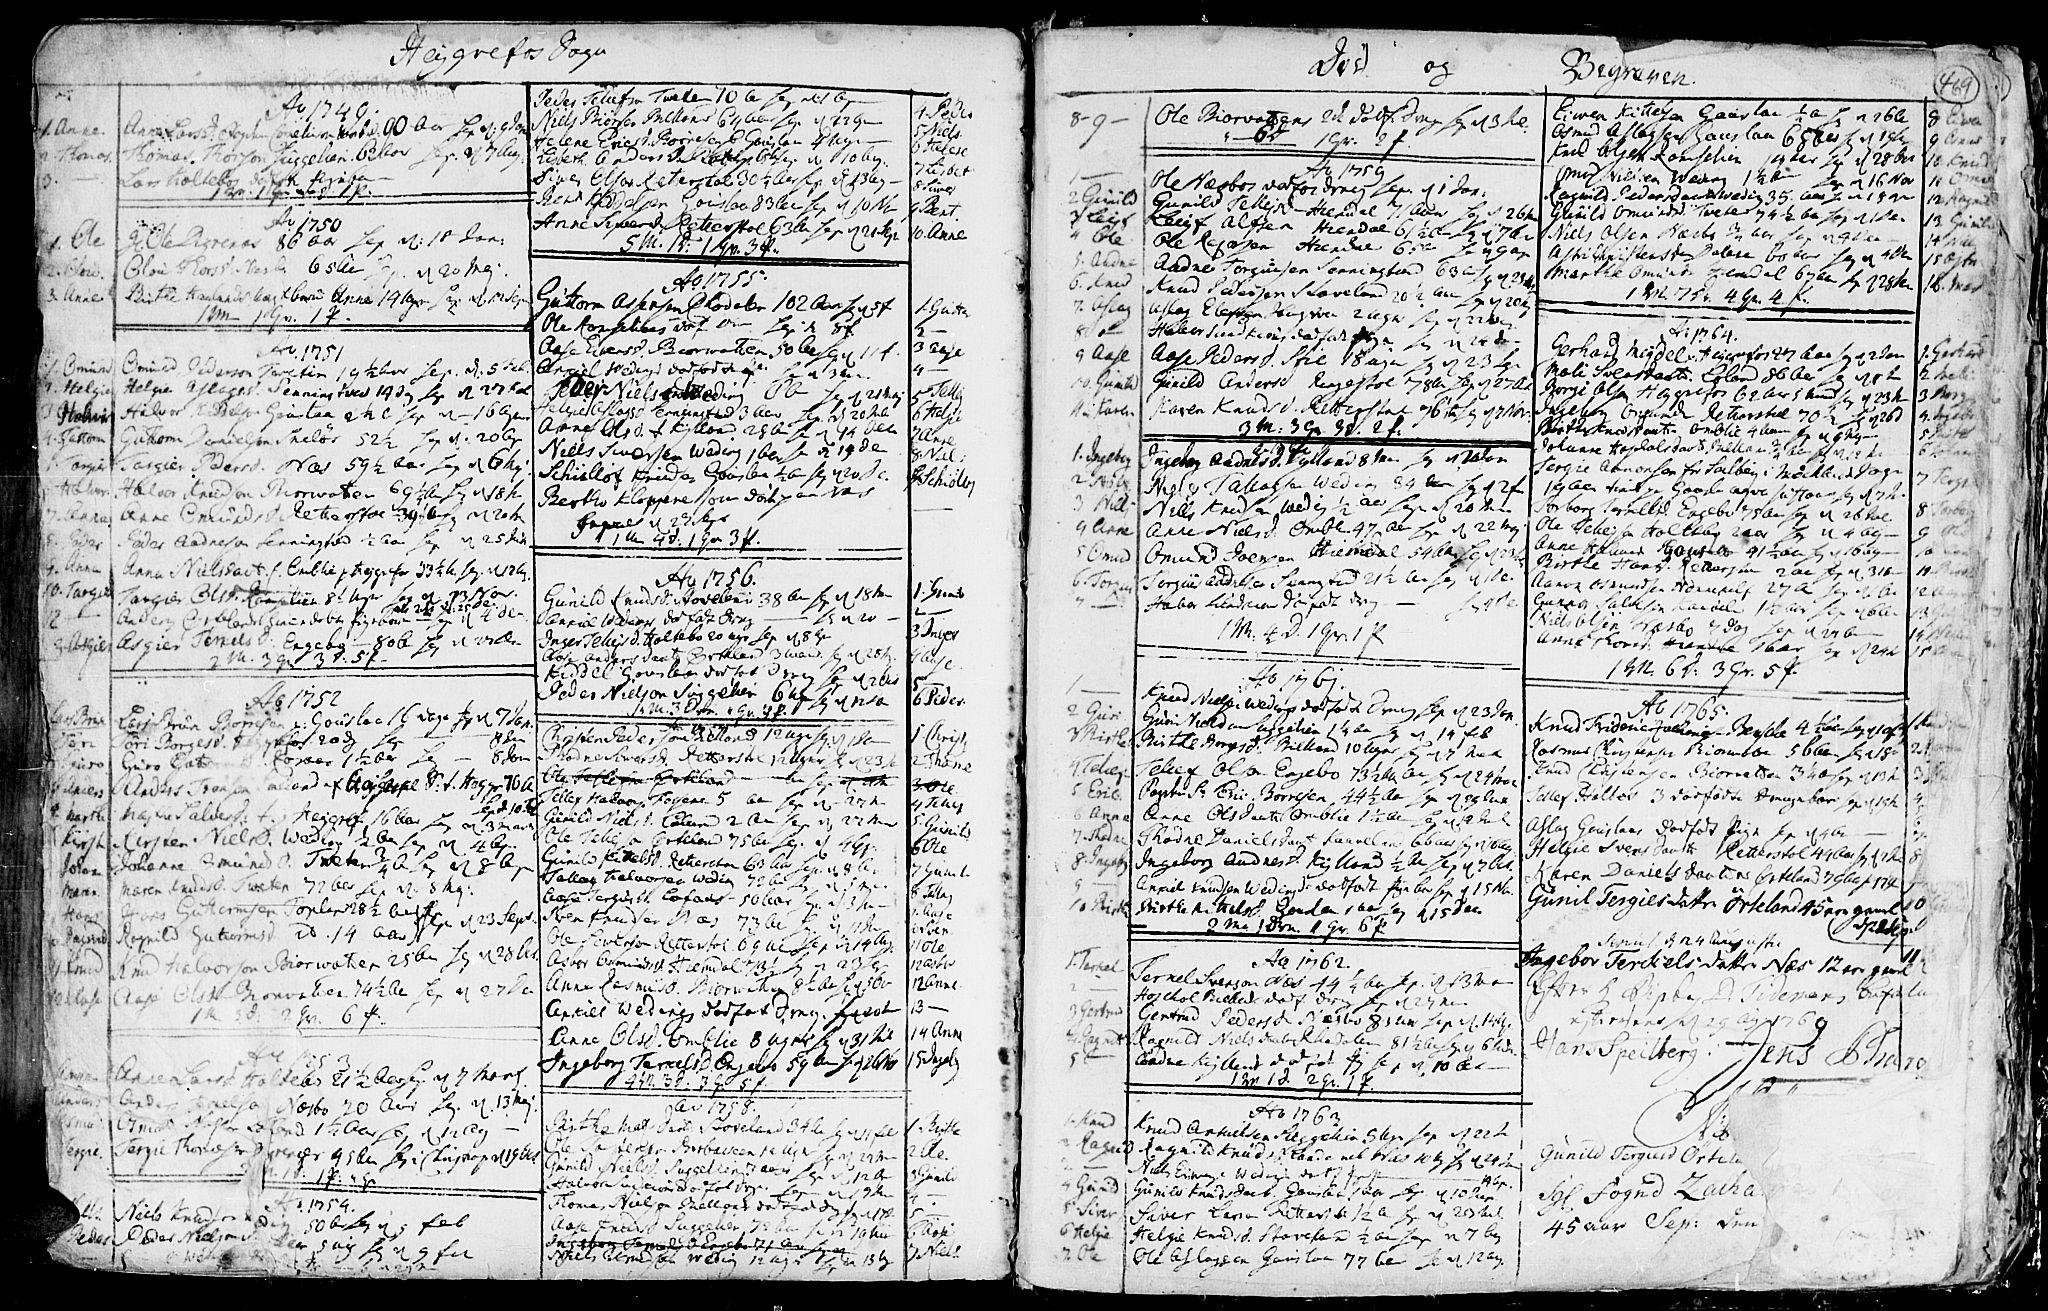 SAK, Hommedal sokneprestkontor, F/Fa/Fab/L0002: Ministerialbok nr. A 2 /3, 1740-1821, s. 469